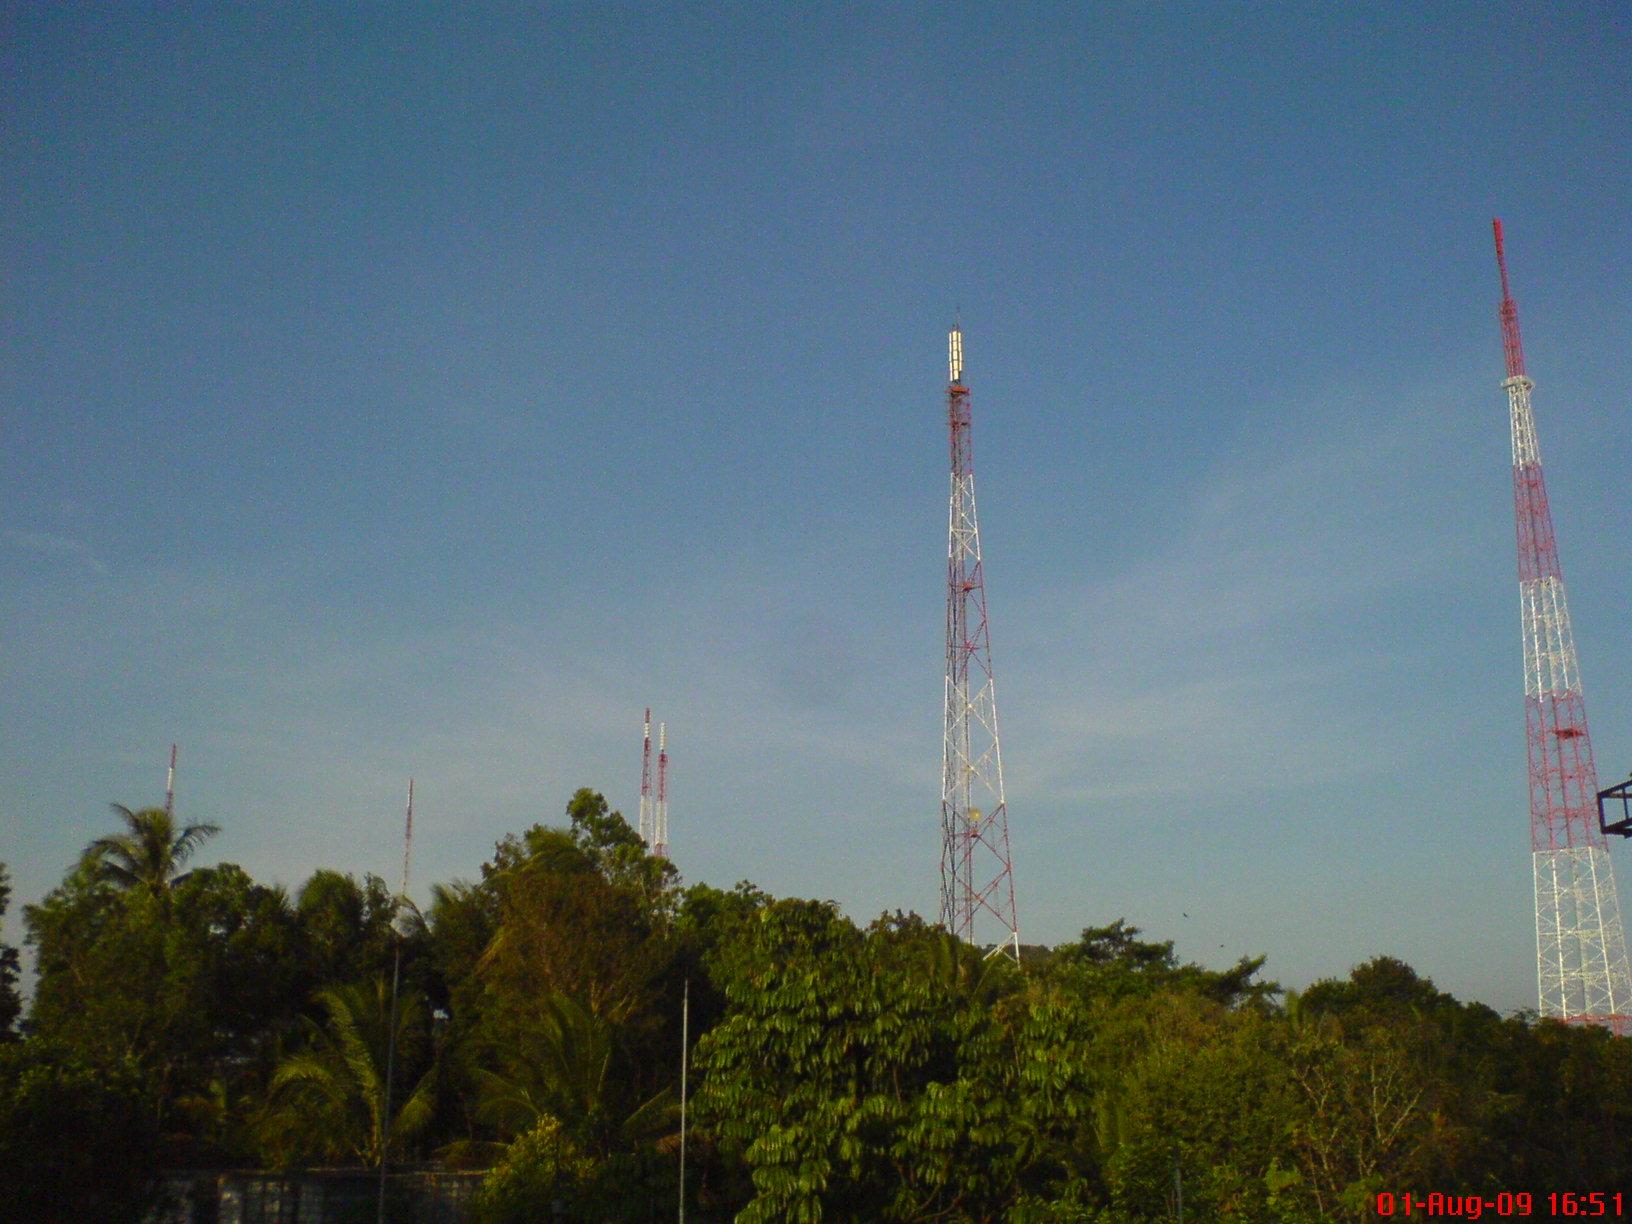 panel antena sudah terpasang (tower yang kanan)